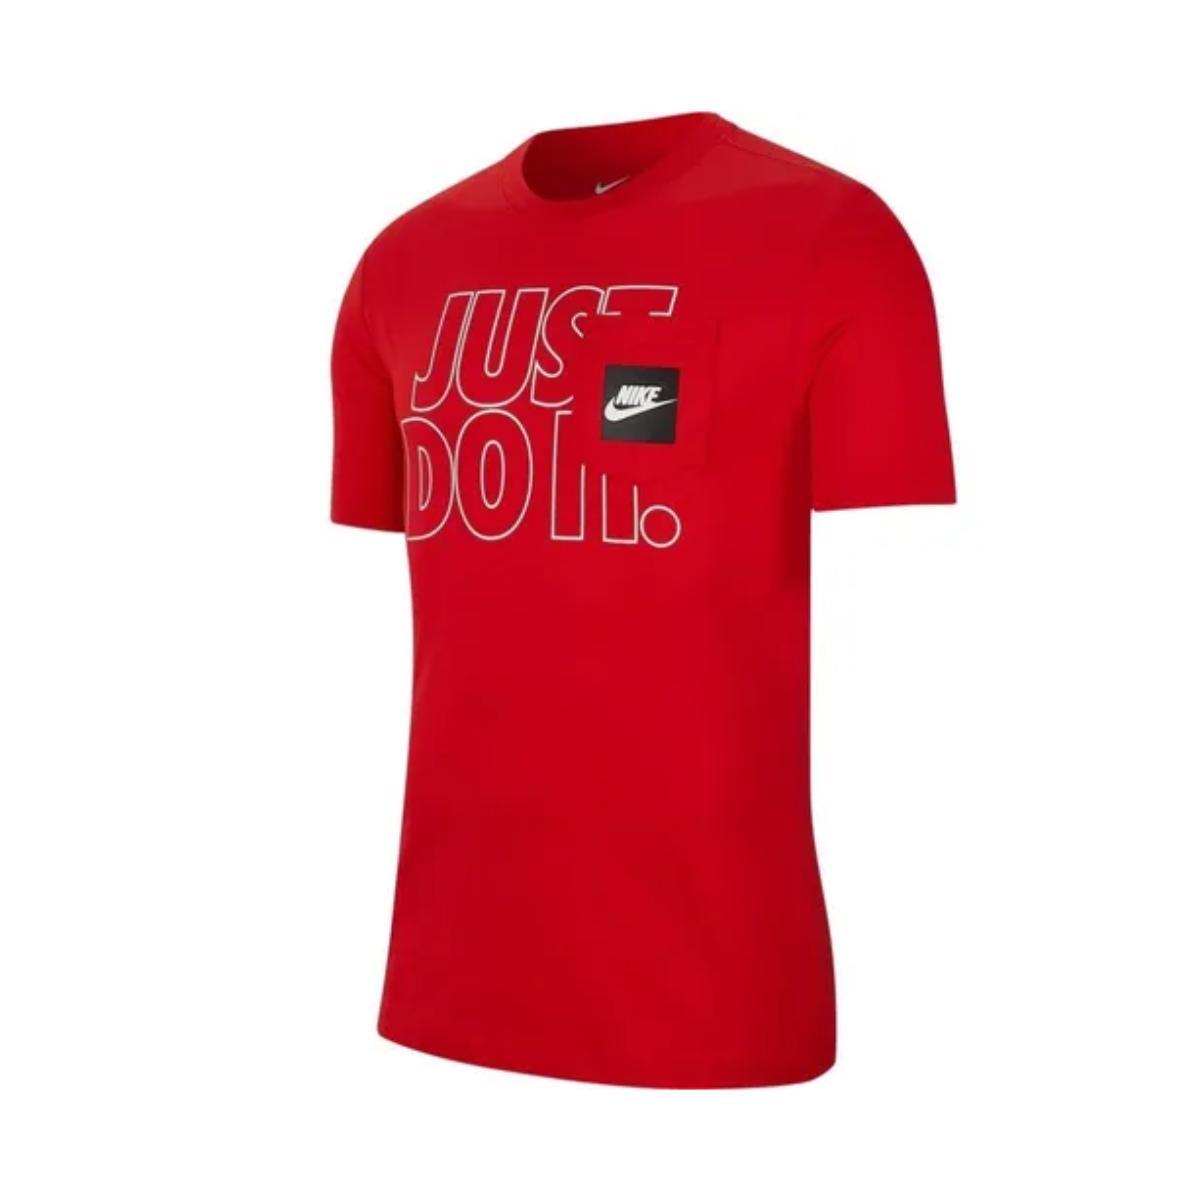 Camiseta Masculina Nike Cd9592-657 Nsw ss Pkt Tee Jdi Outline Vermelho/branco